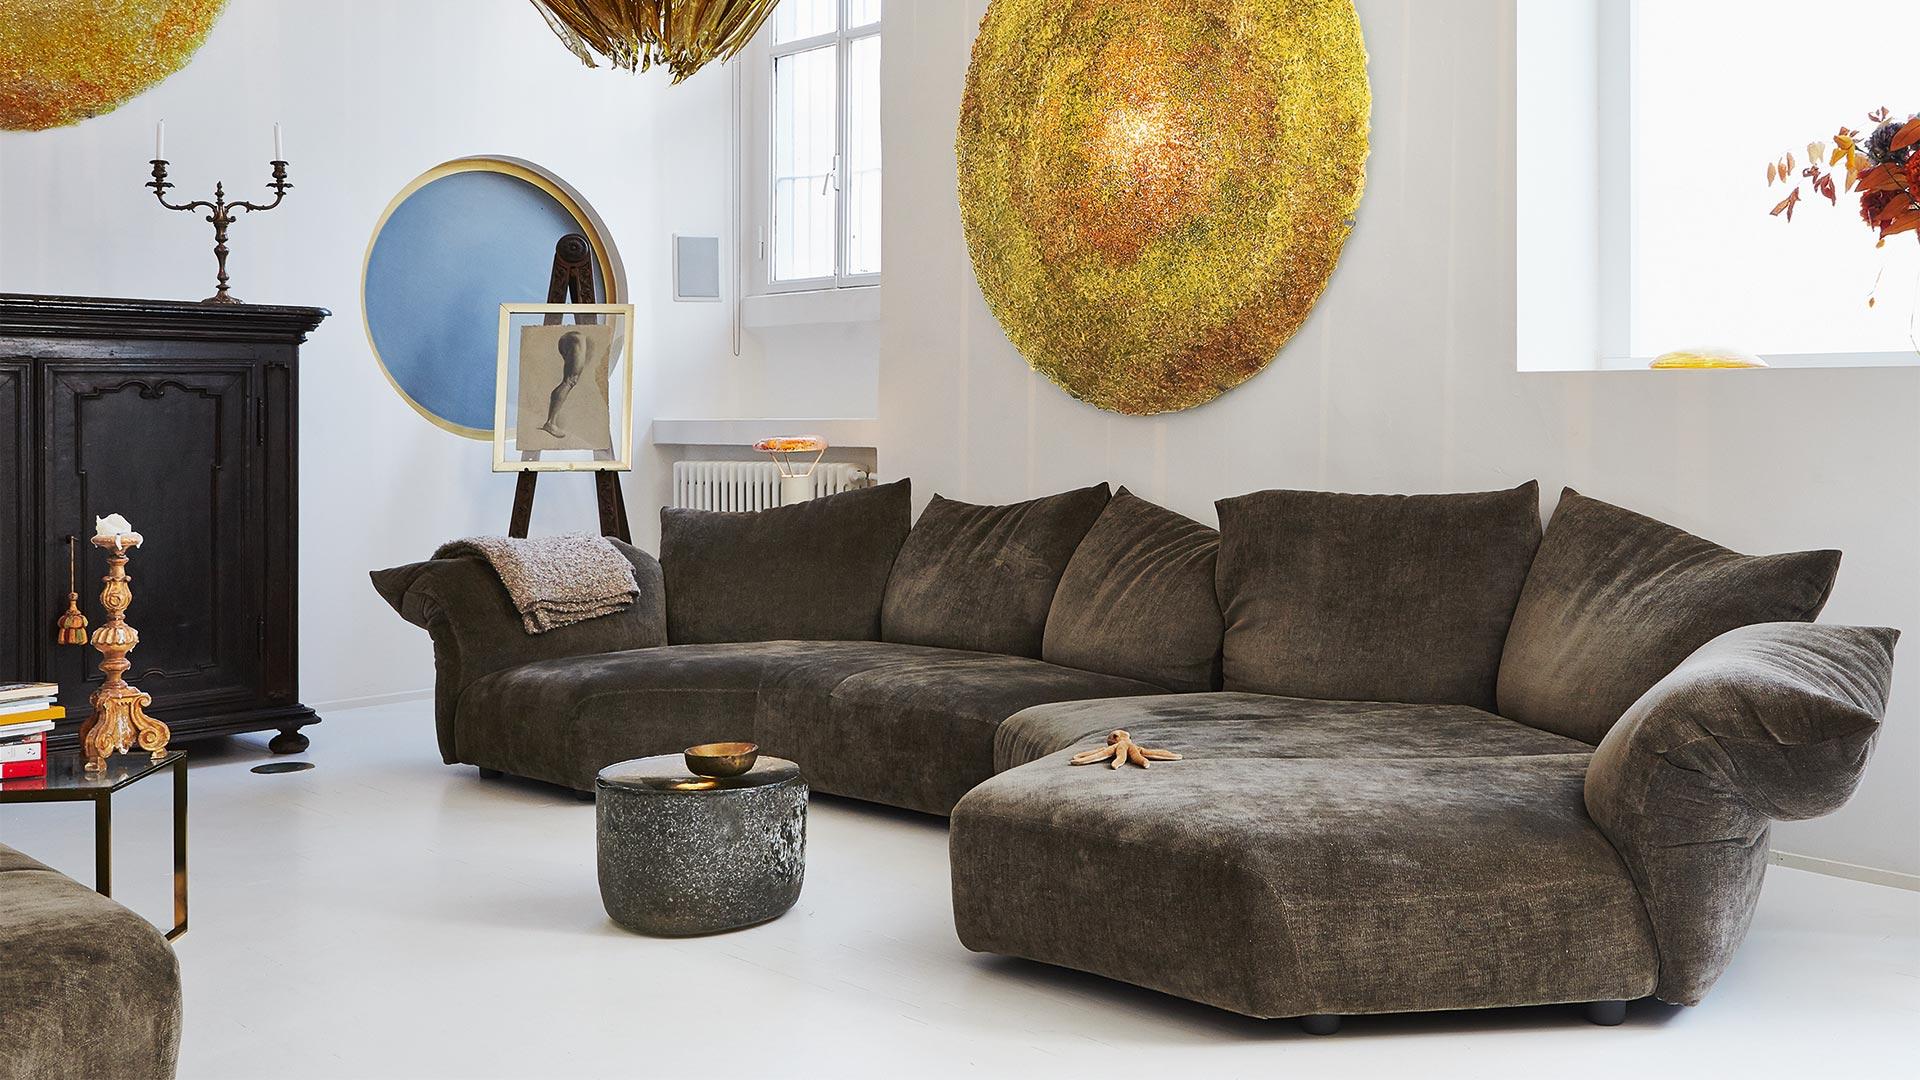 Edra Standard Sofa in Berlin bei steidten+